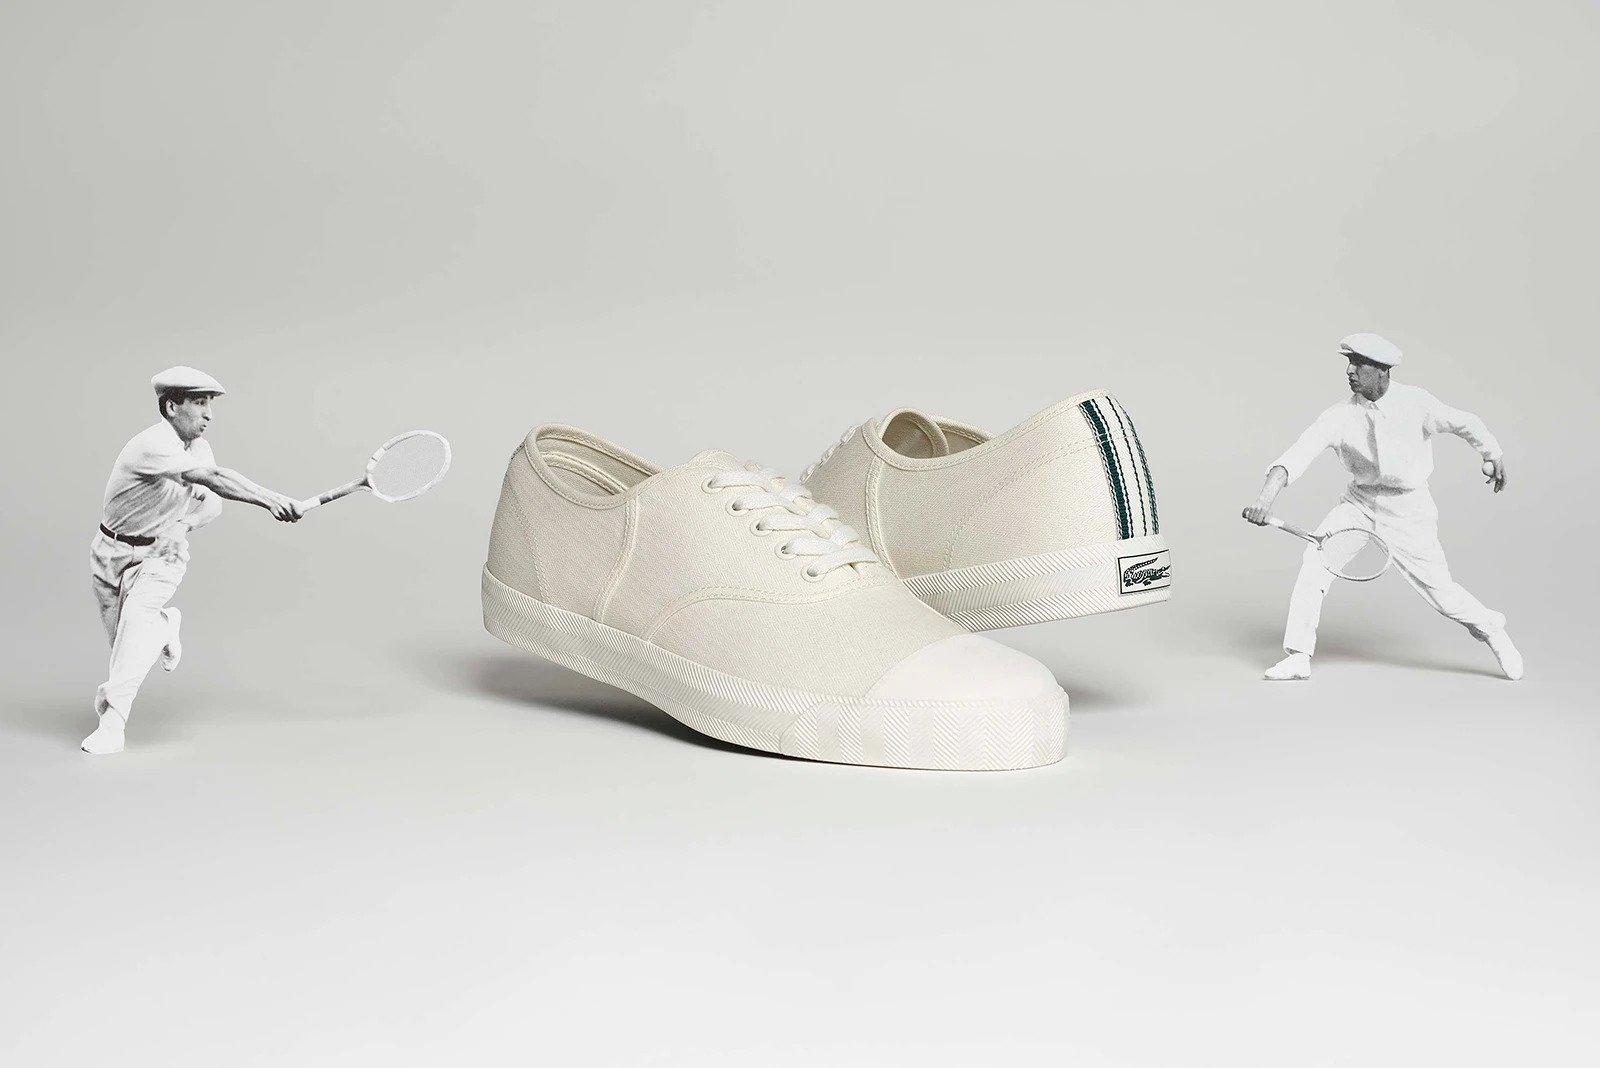 lacoste, rene, tennisschoenen, tennis-sneakers, 1963